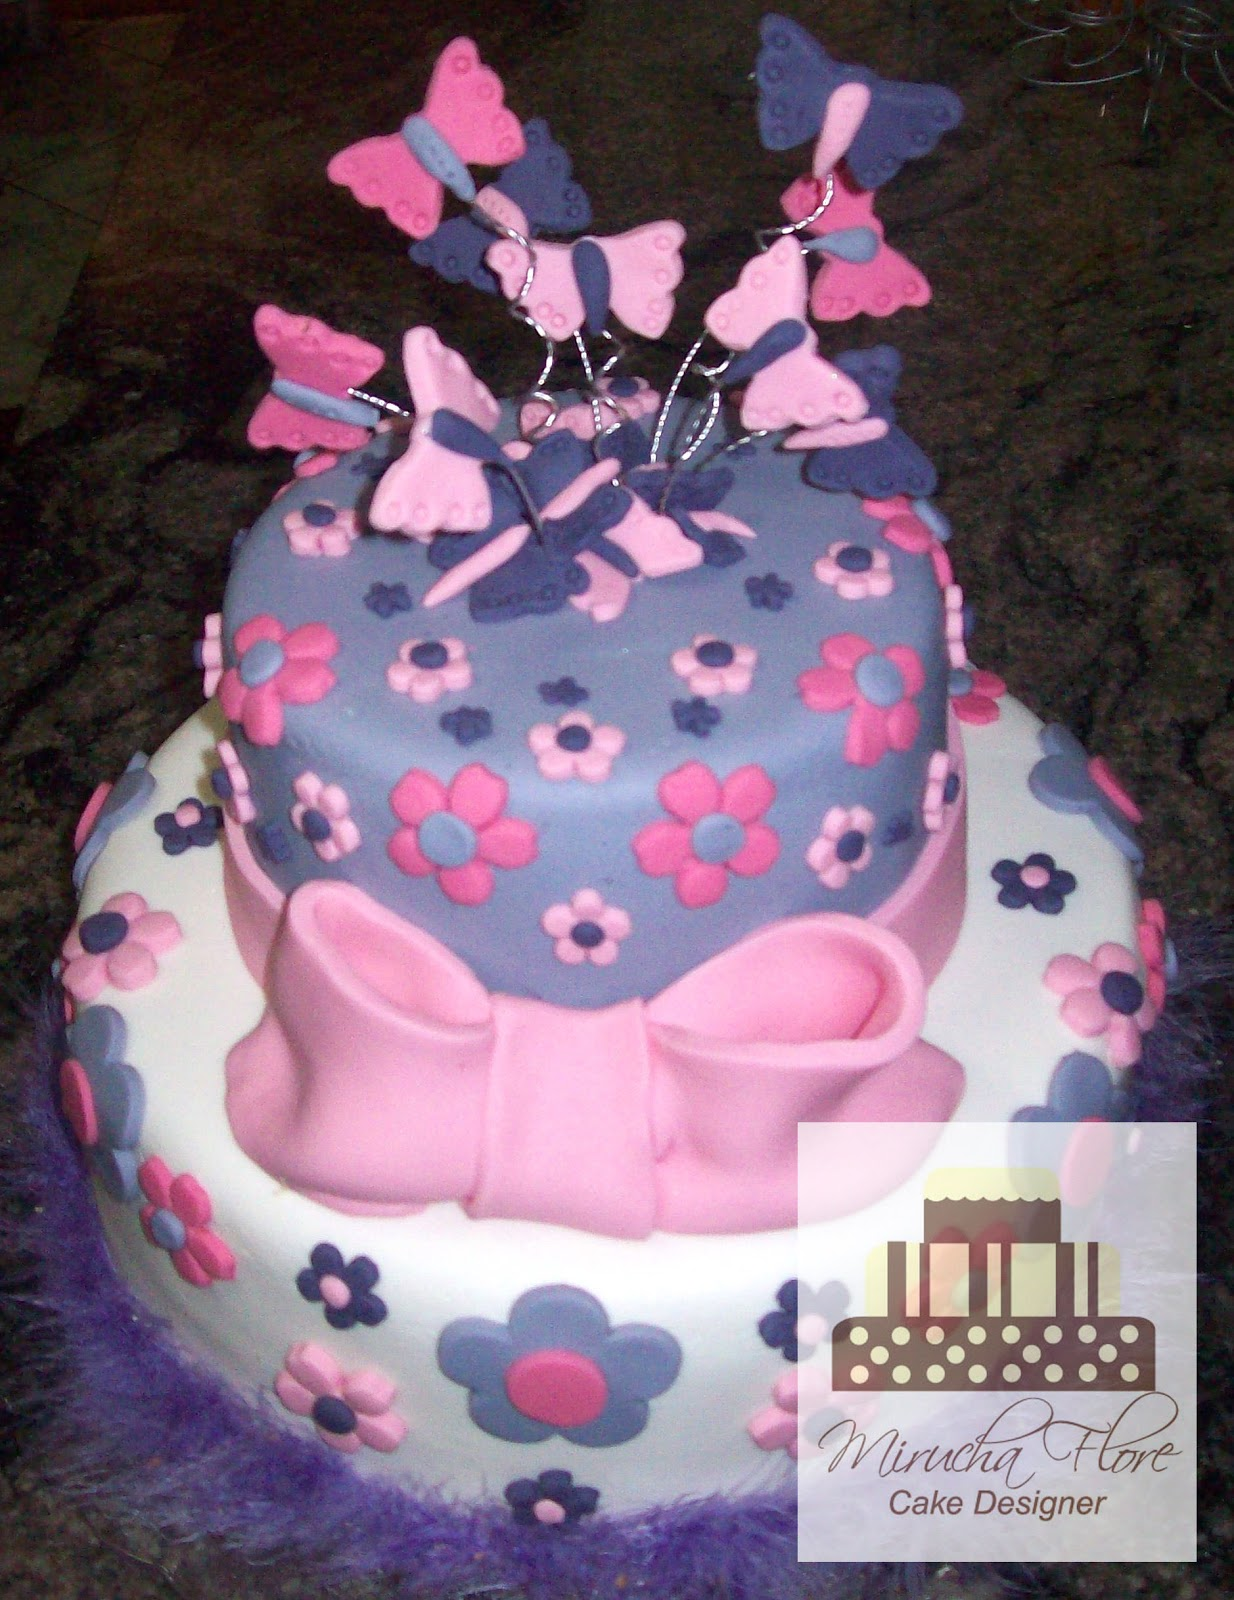 Pin Bolo Borboletas Para Comemorar O Aniversário Da Antonia De 2 Cake